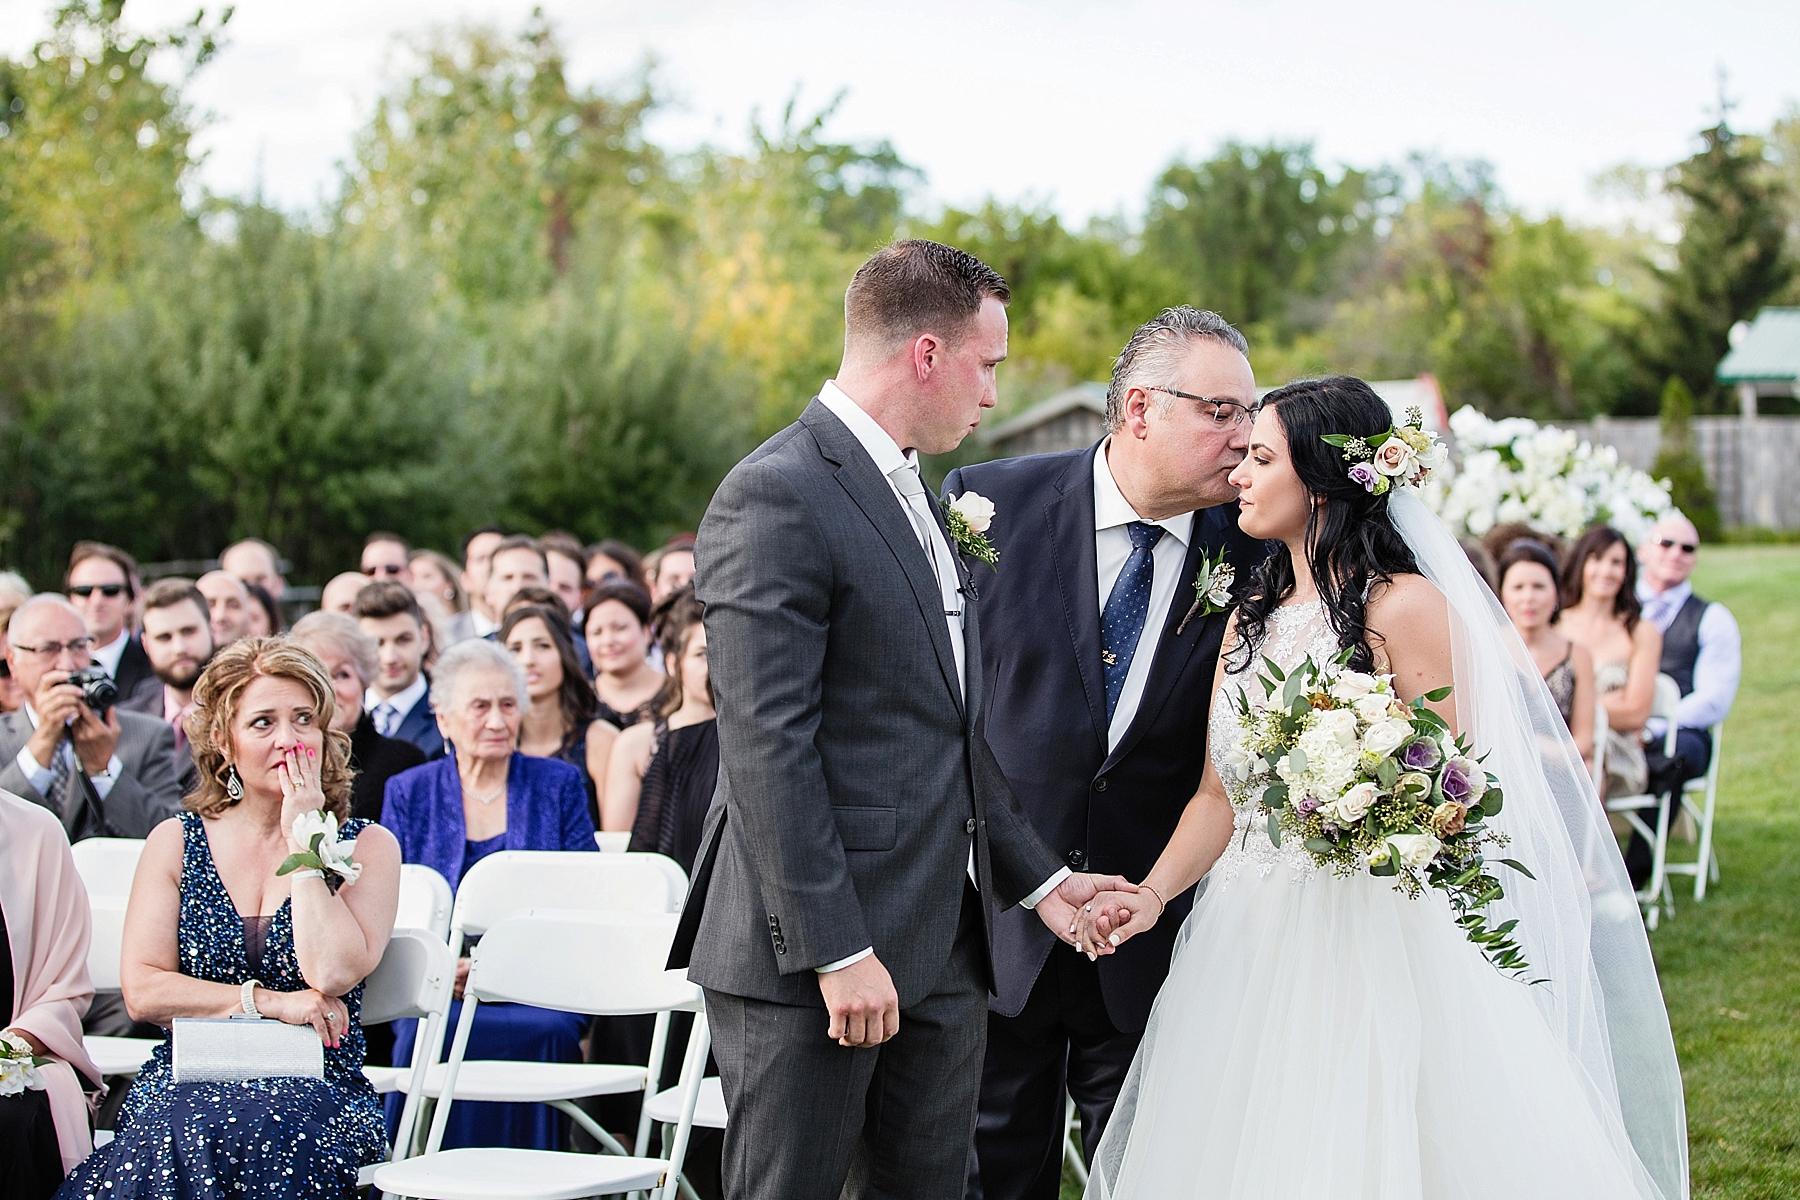 windsor-wedding-photographer-sprucewood-shores-winery-wedding-niagara-on-the-lake-wedding-photographer-eryn-shea-photography_0050.jpg